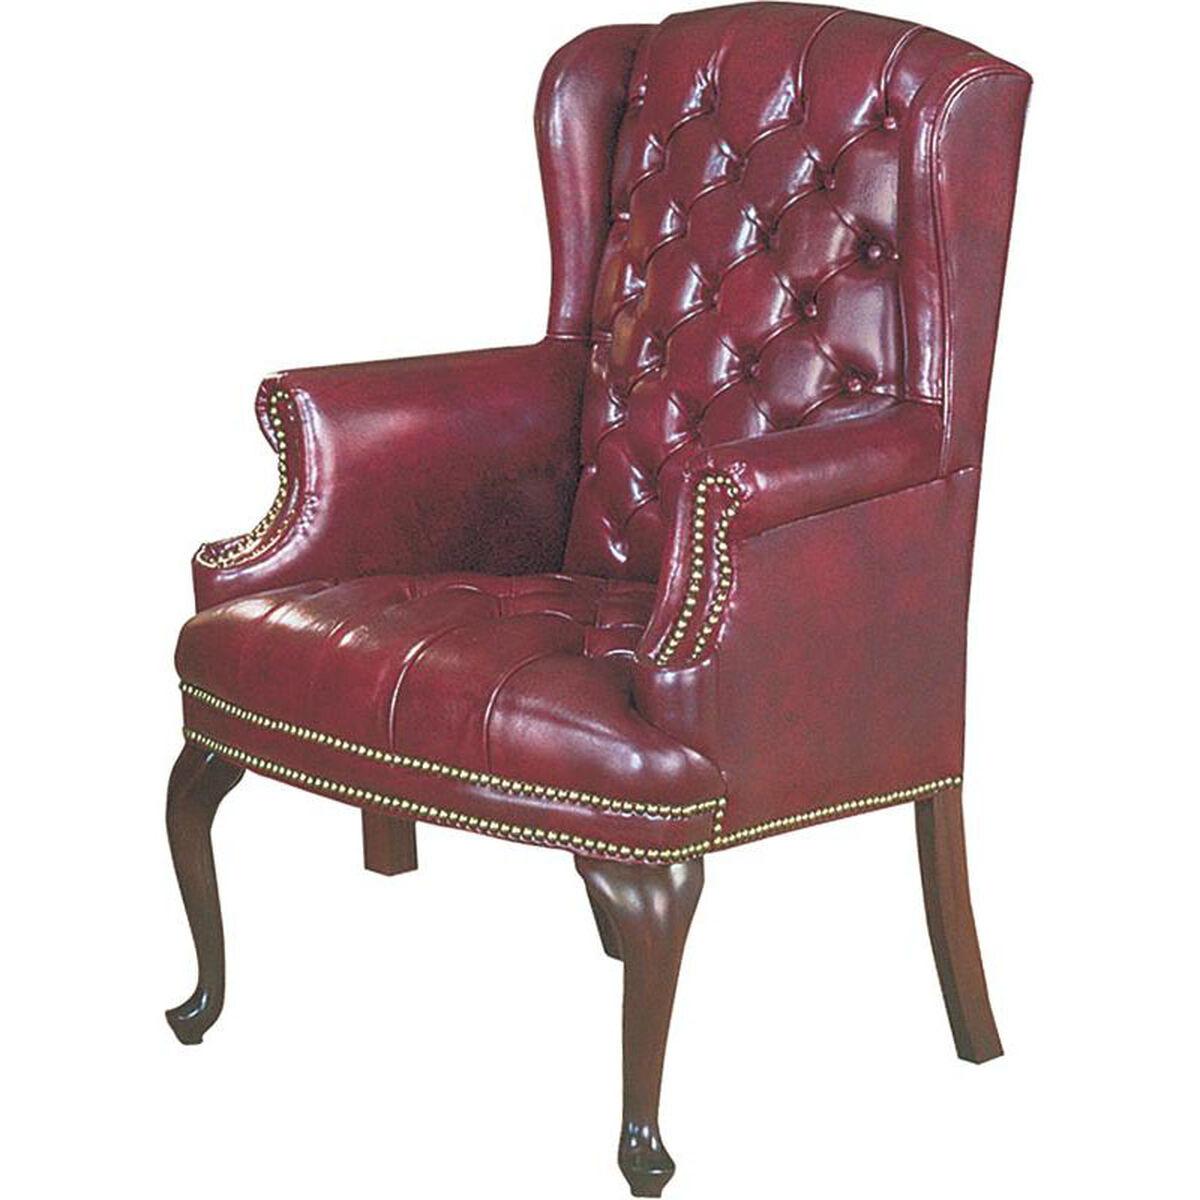 High Point Furniture Industries 4073 Hpf 4073